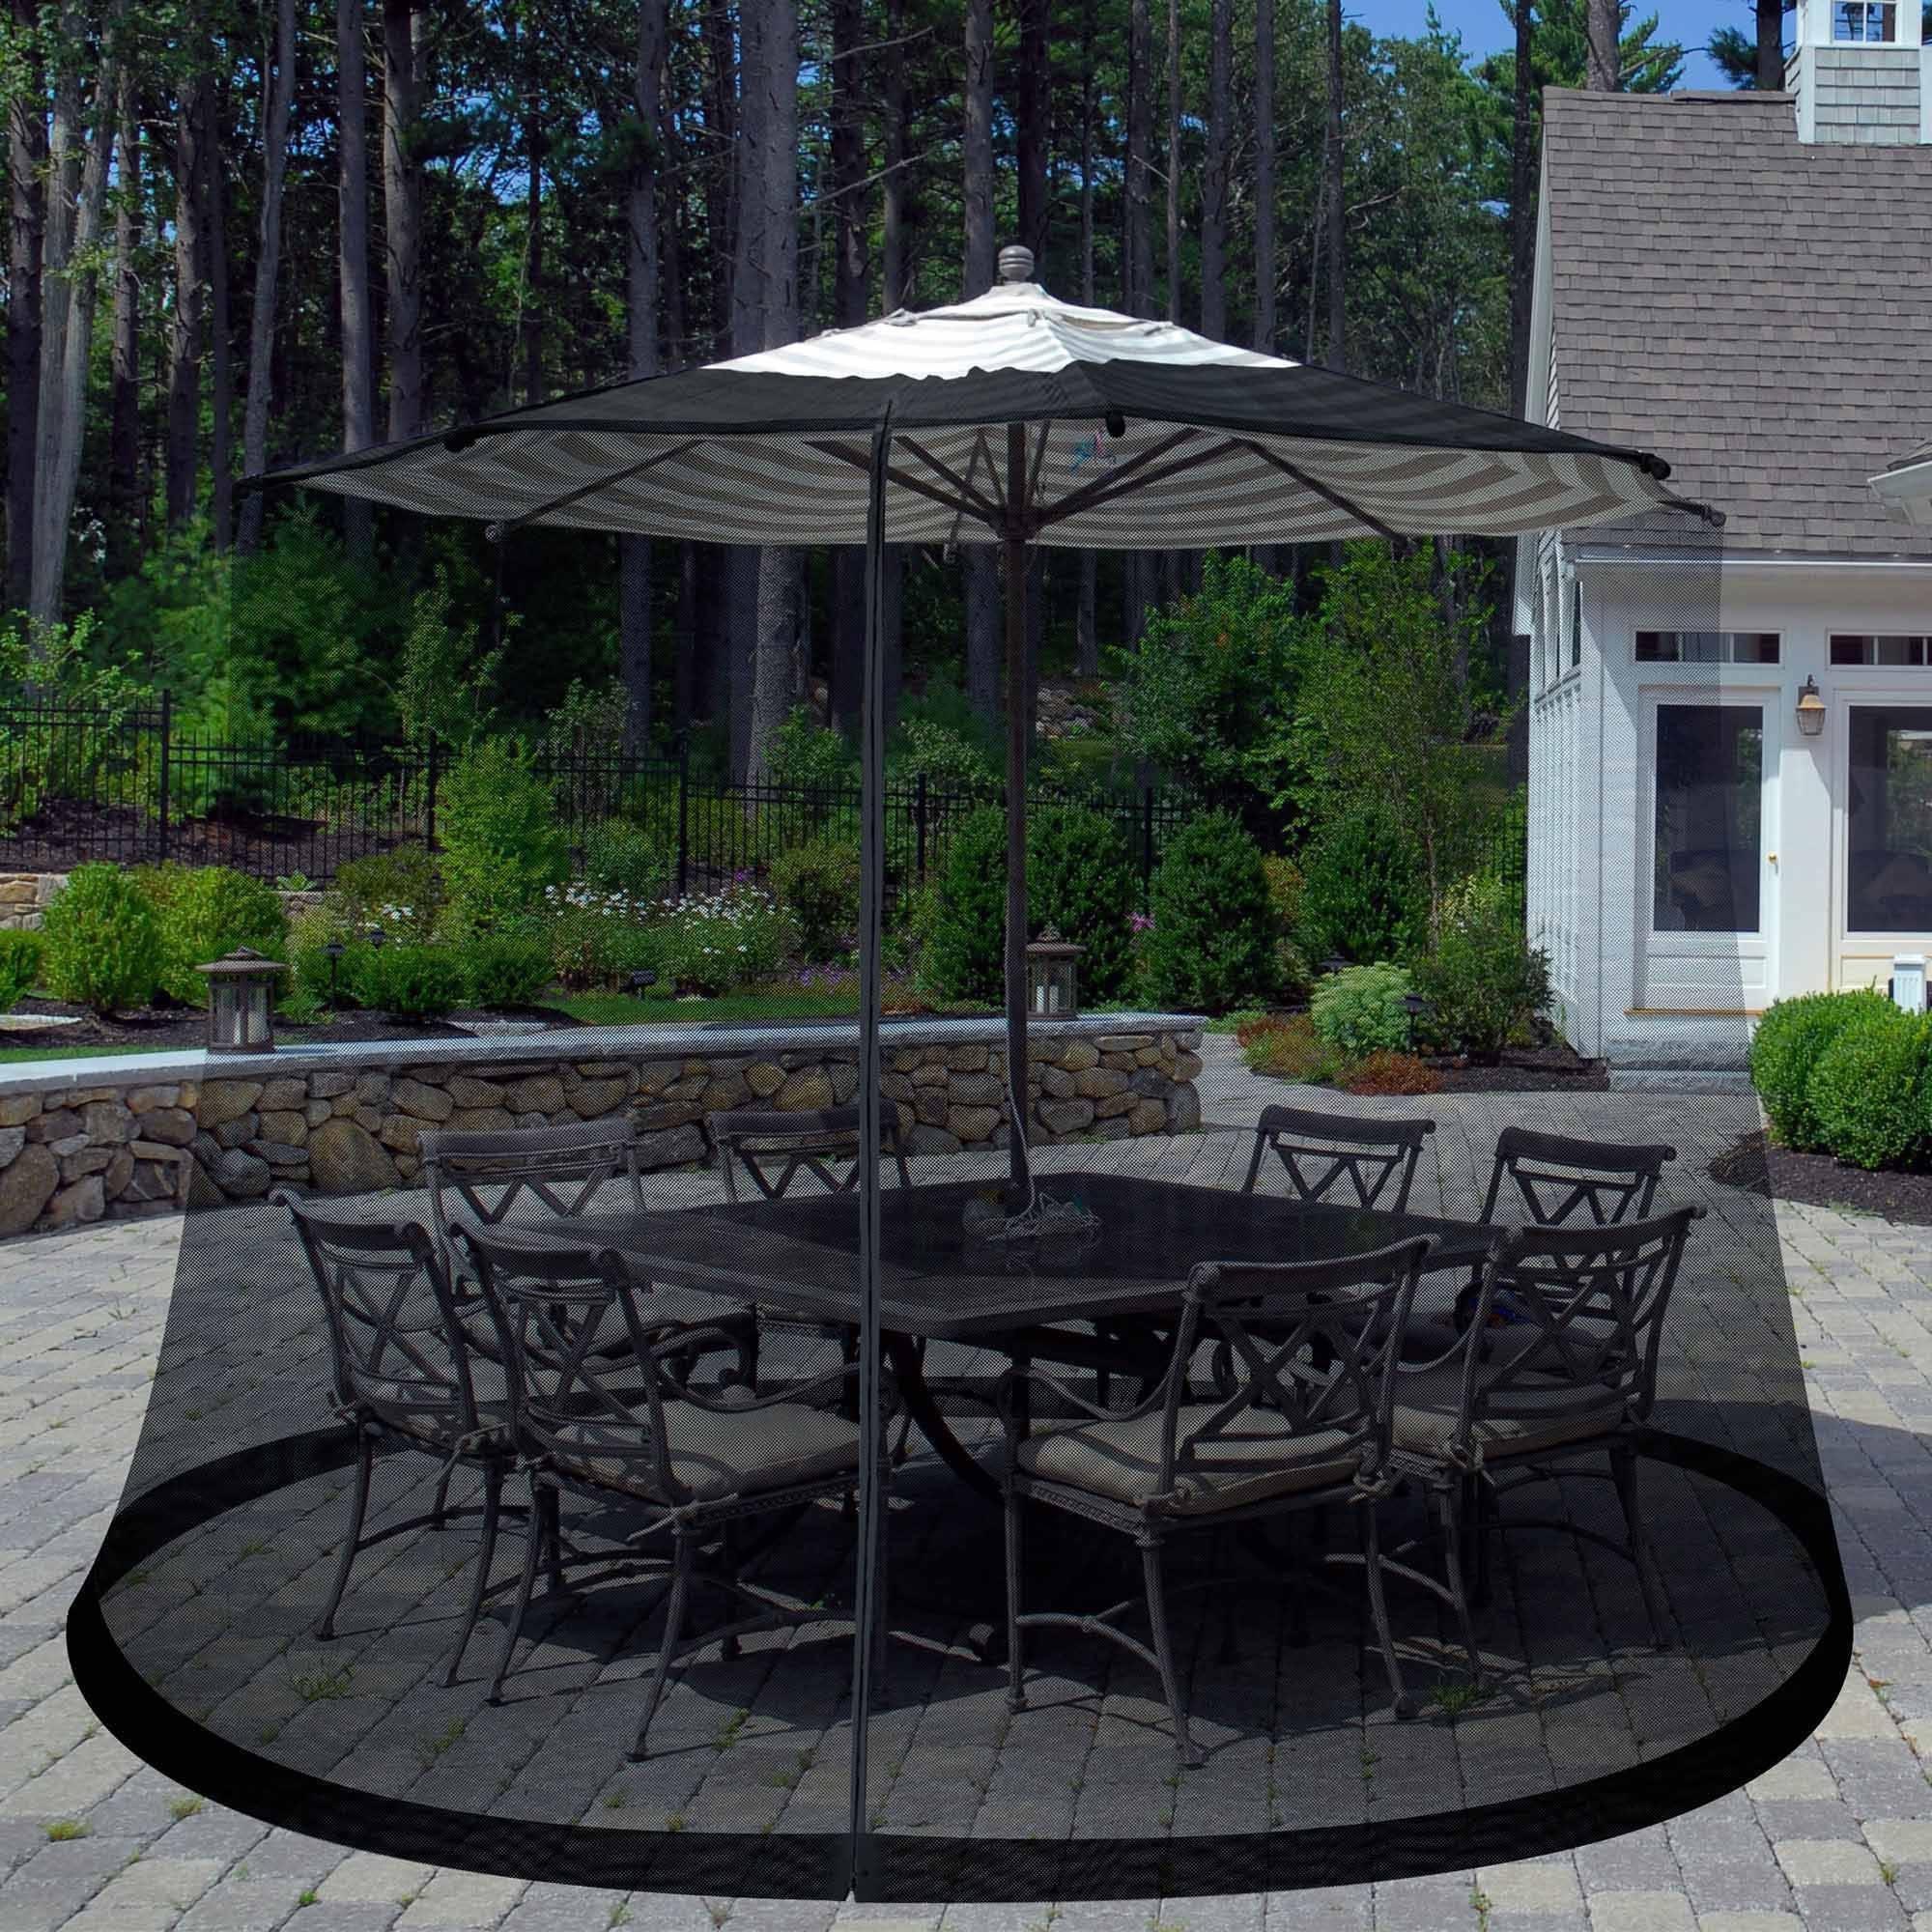 Furniture: Costco Cantilever Umbrella For Most Dramatic Shade With Popular Sunbrella Black Patio Umbrellas (View 6 of 20)